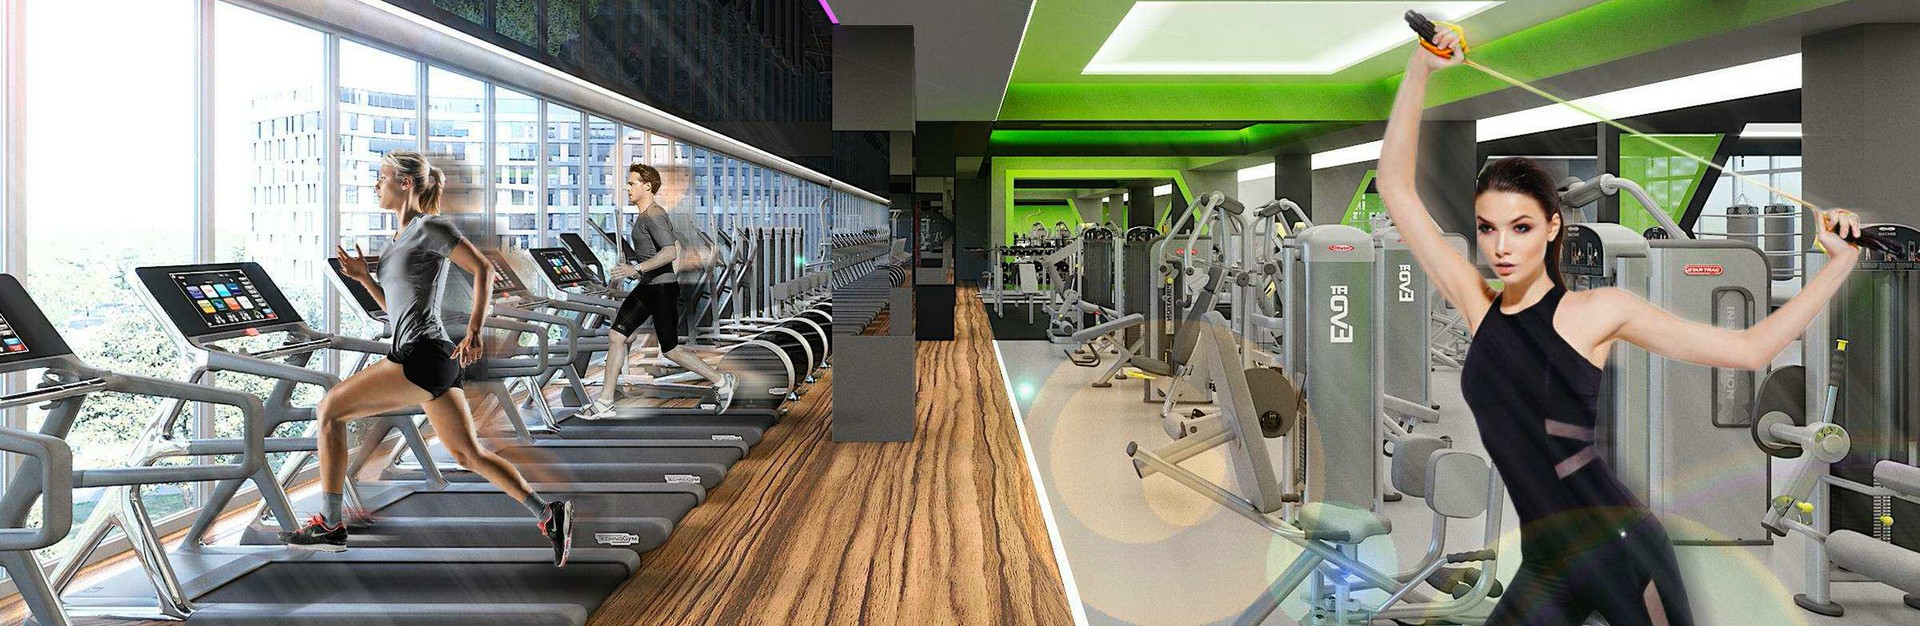 Х-FIT фитнес-центр